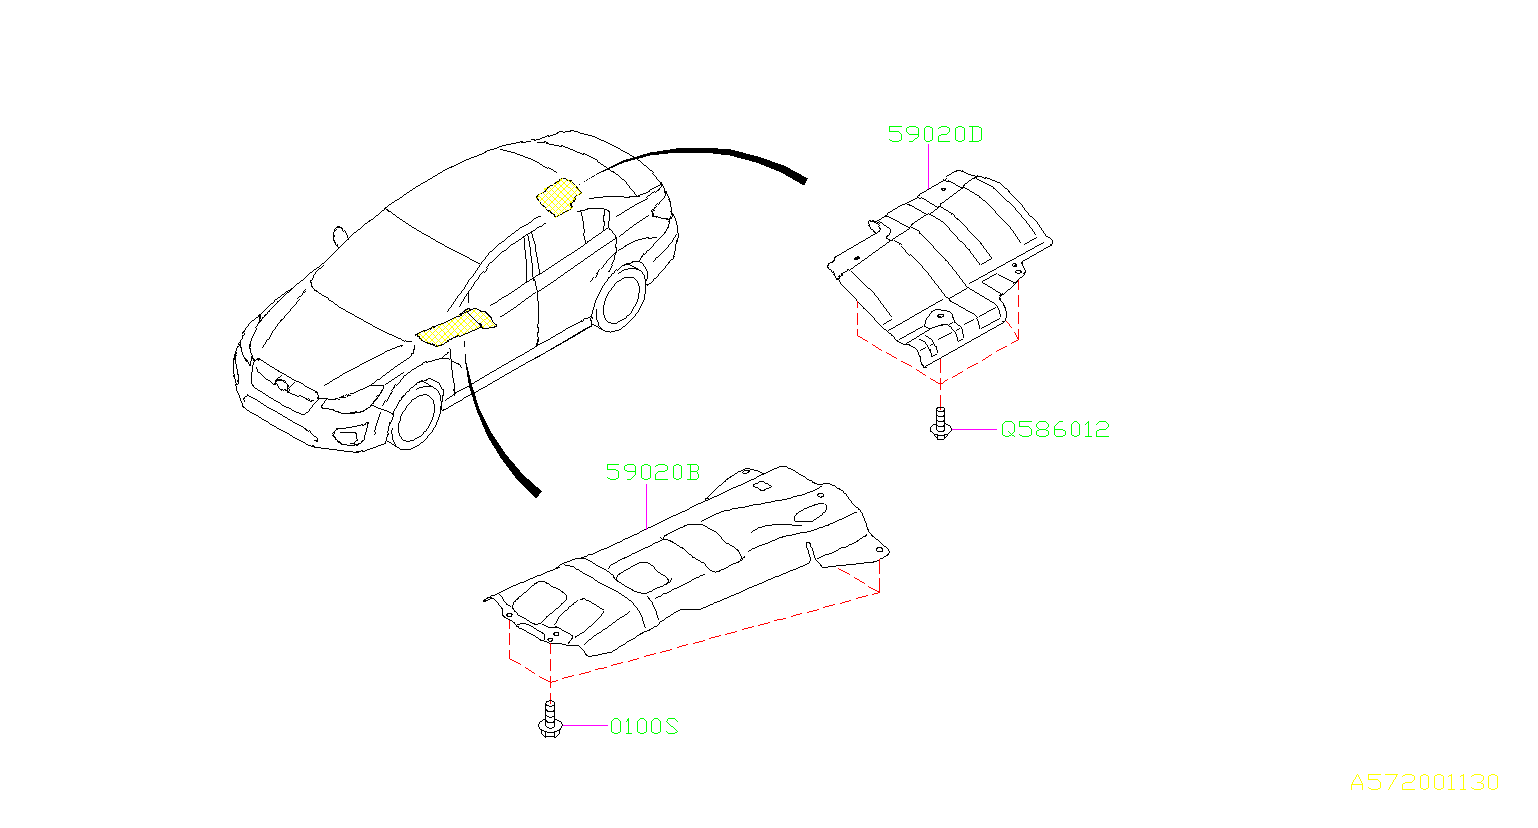 Subaru Impreza Headlight Mounting Bolt Tapping Screw